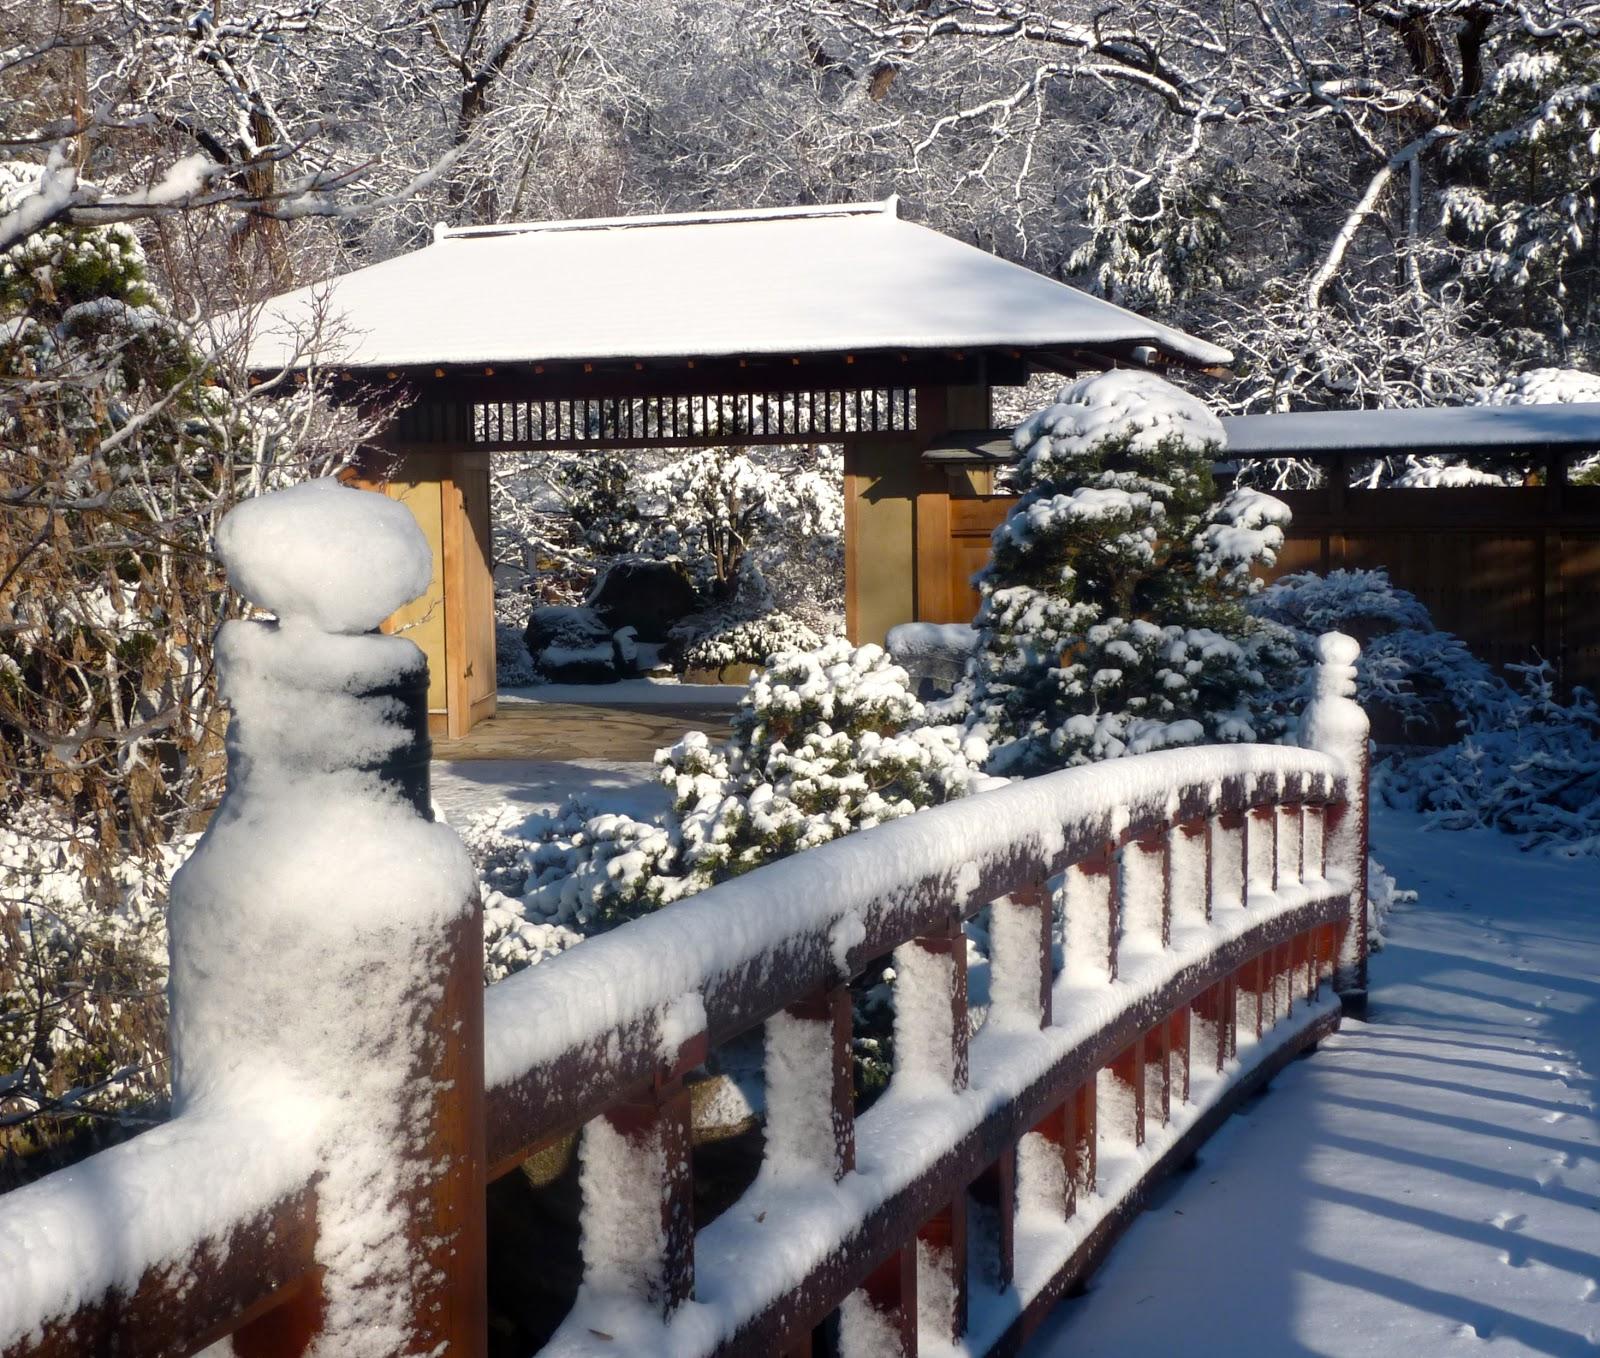 Garden Of Reflection Winter In Anderson Japanese Gardens